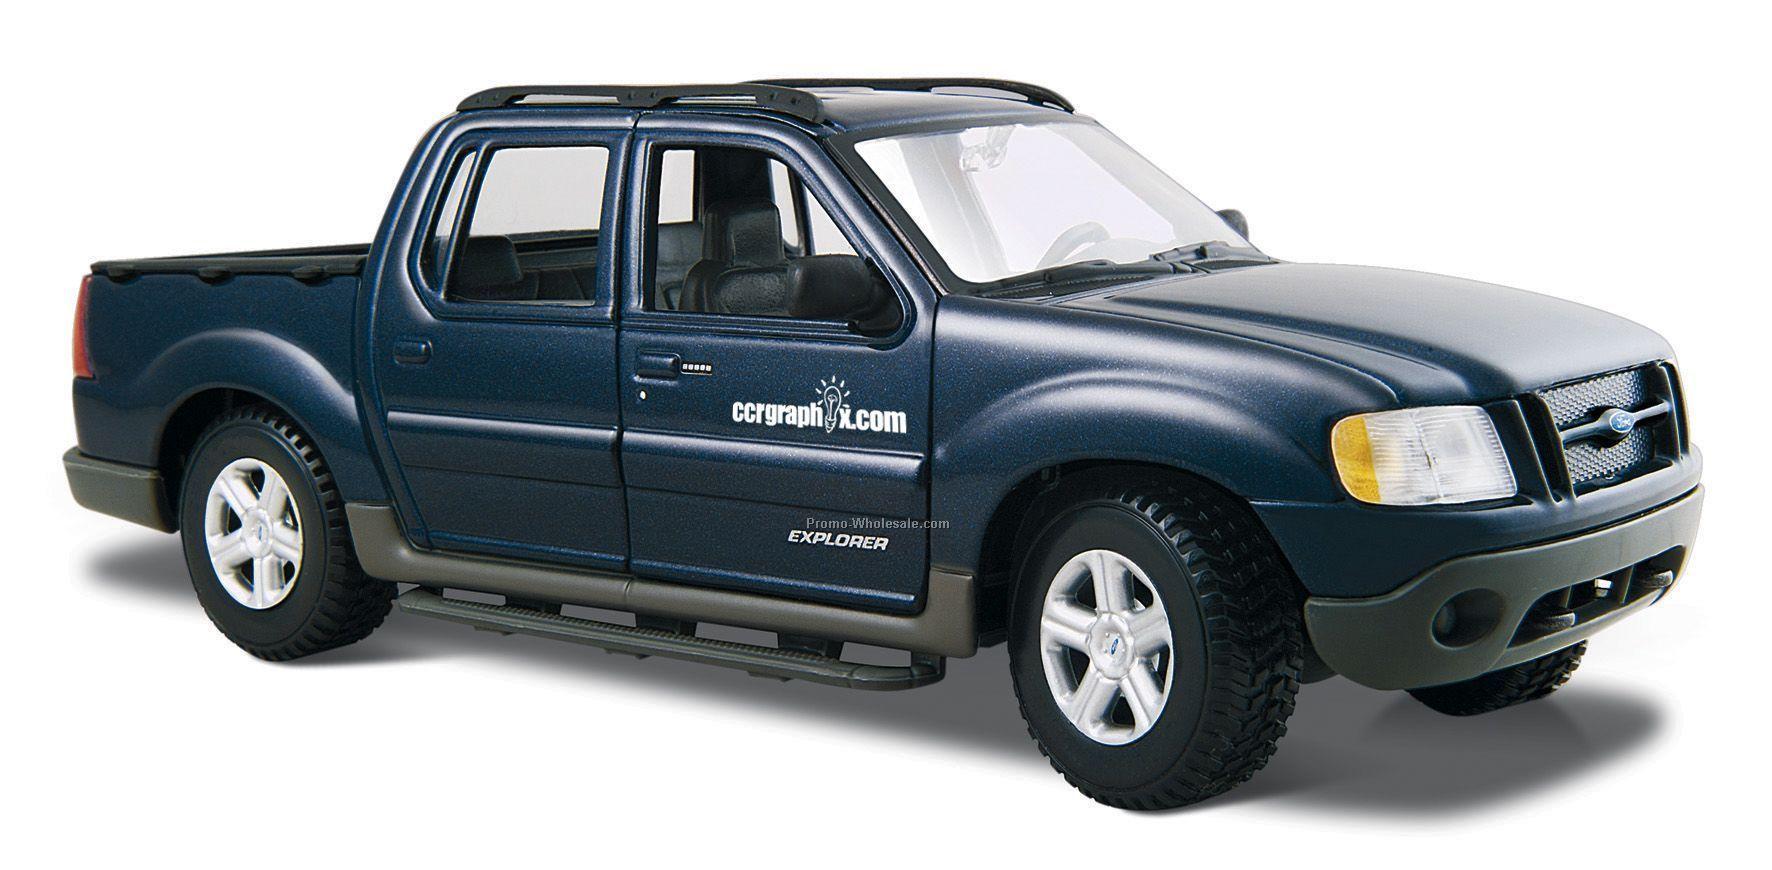 "7""x2-1/2""x3"" Ford Explorer"